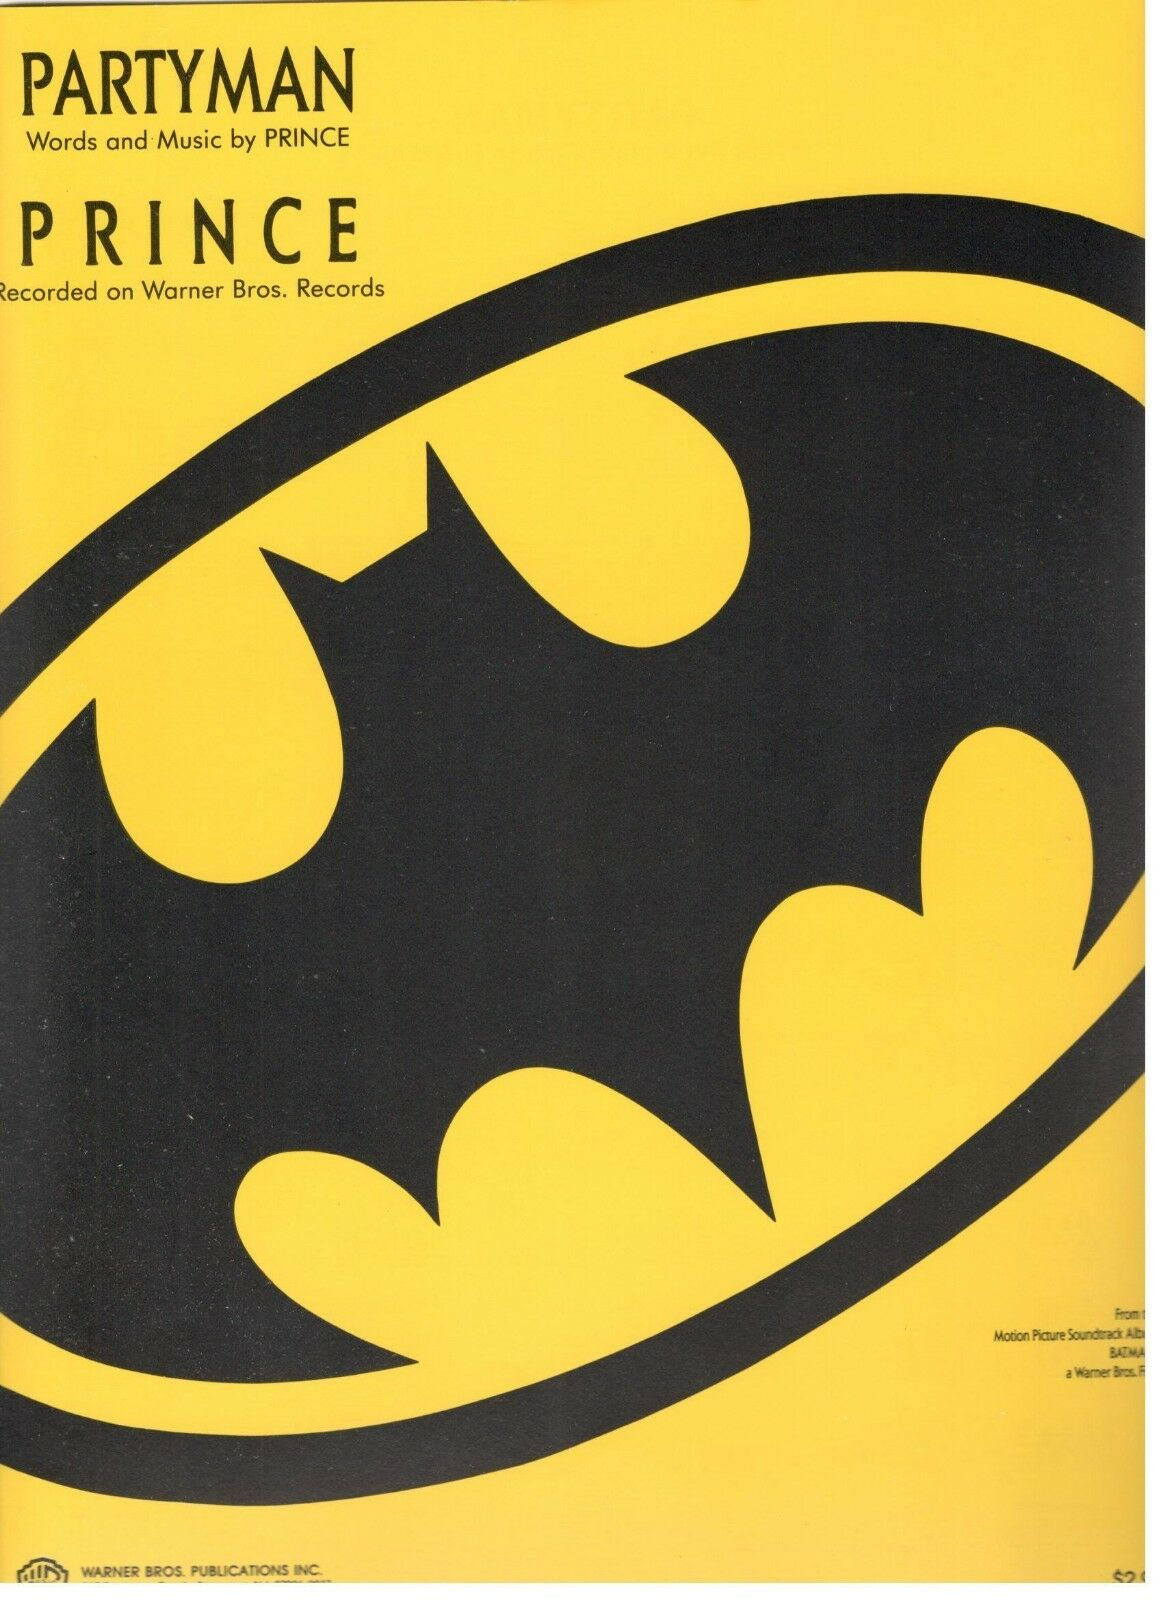 PRINCE  PARTYMAN  SHEET MUSIC-PIANO VOCAL GUITAR CHORDS-1989-BATMAN-RARE-NEW